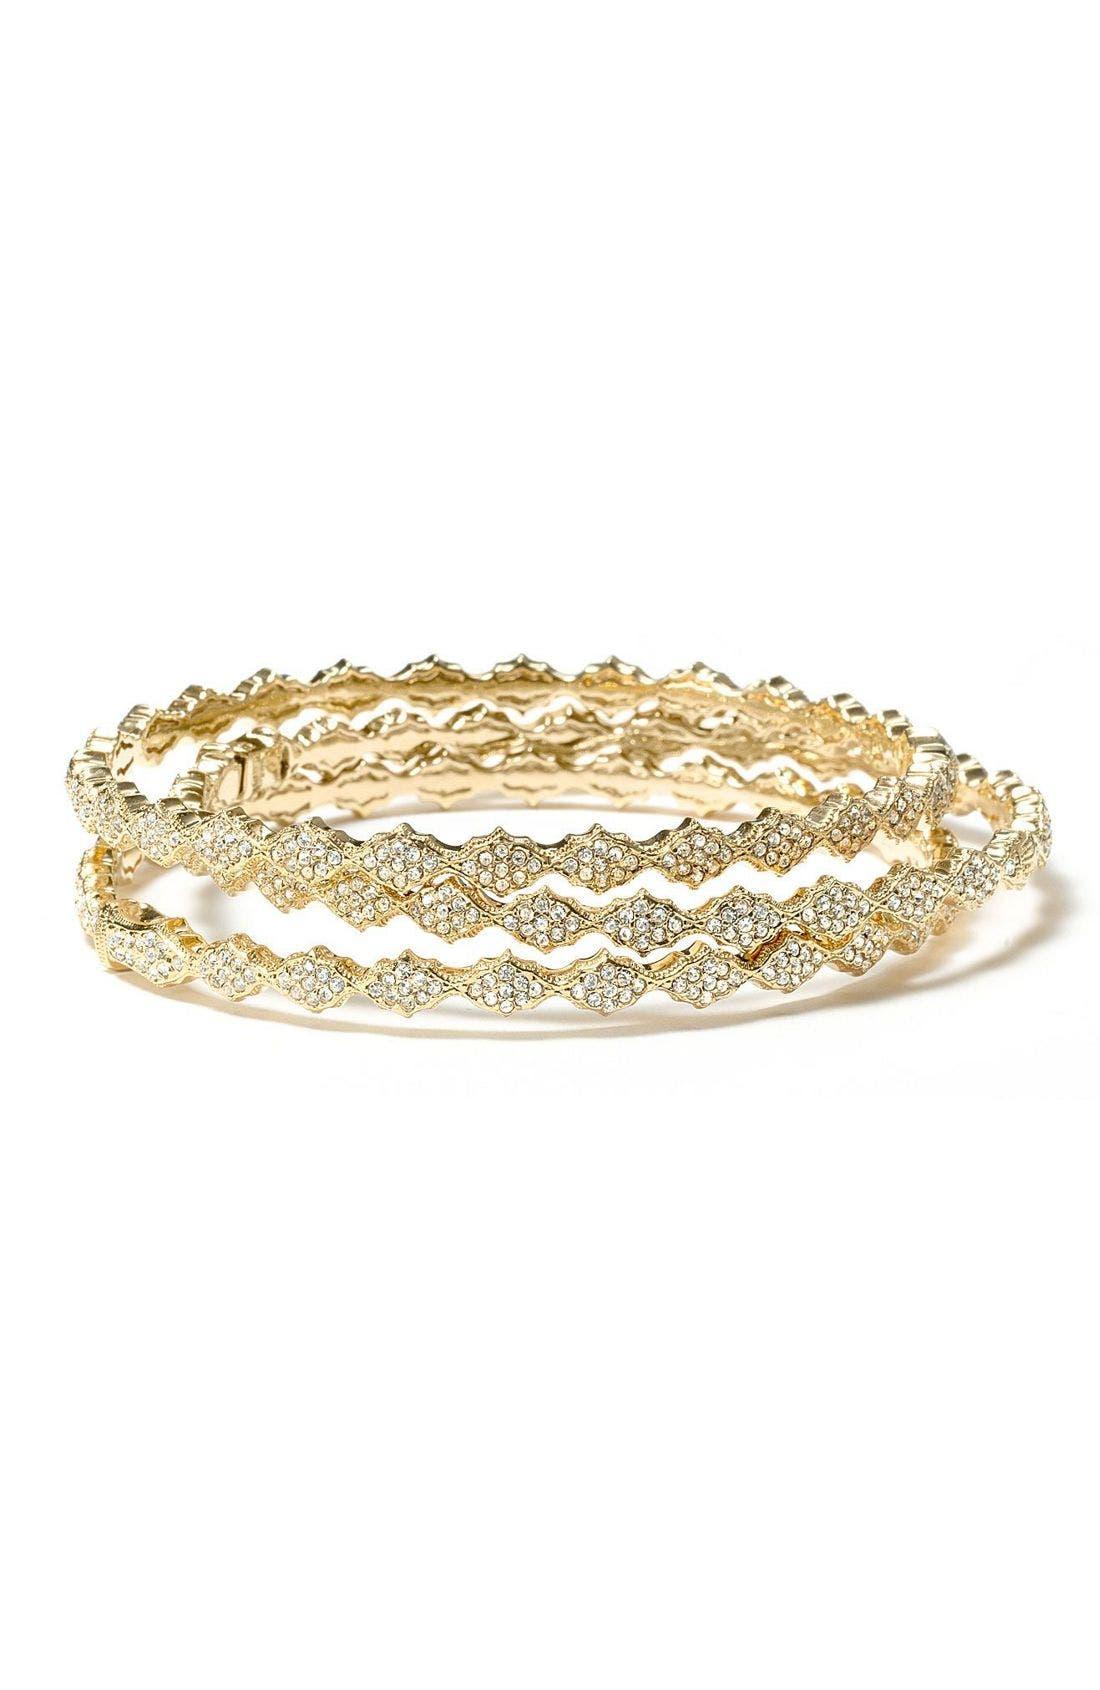 Main Image - Nadri Crystal Filigree Bangle Bracelet